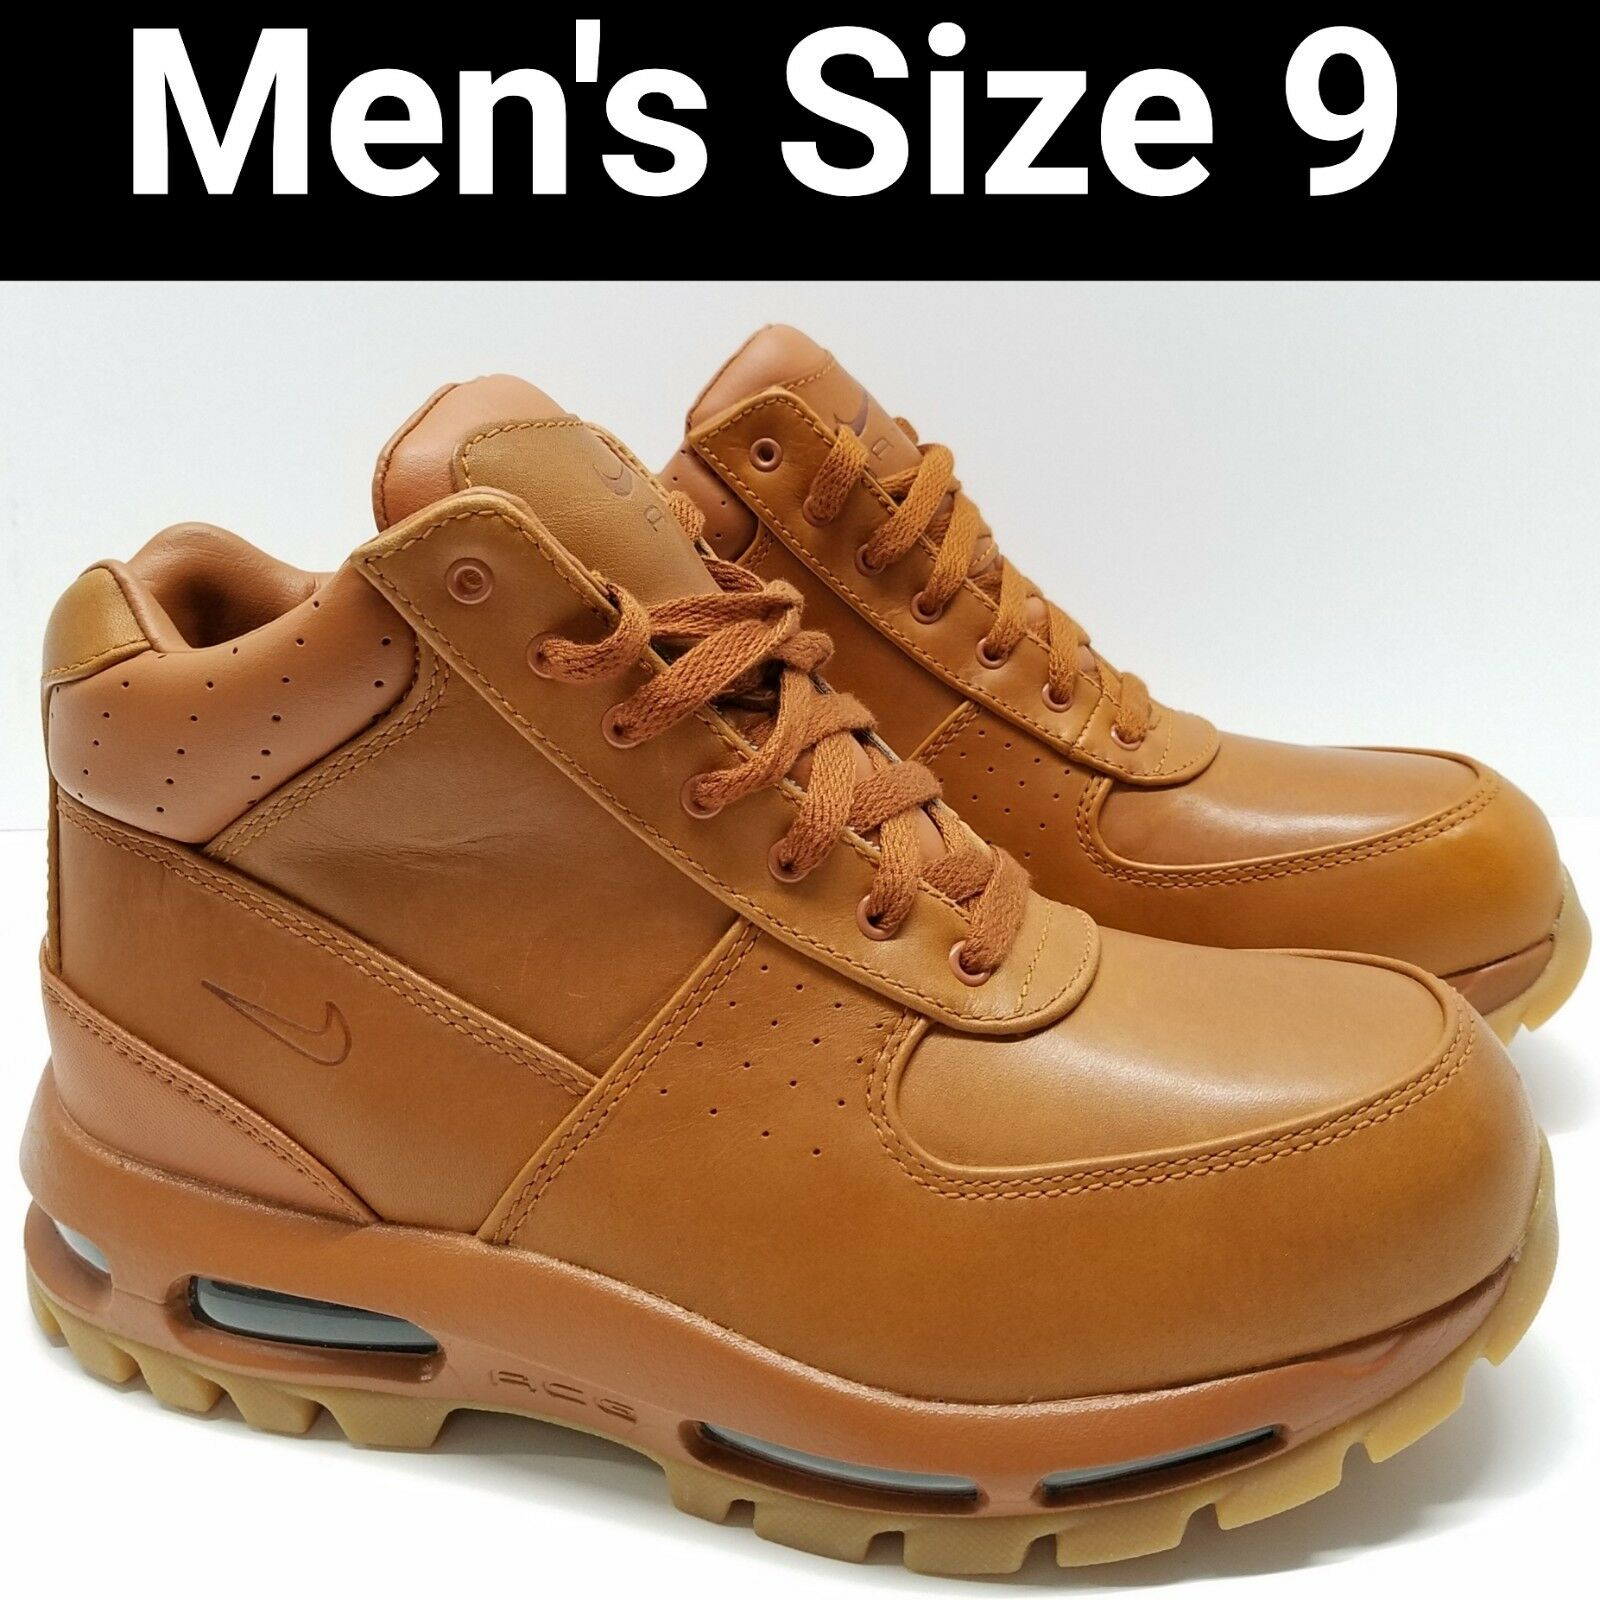 d031a56abf Nike Air Max Goadome BOOTS -tawny/gum Light Brown -865031 208 Mens Sz 9